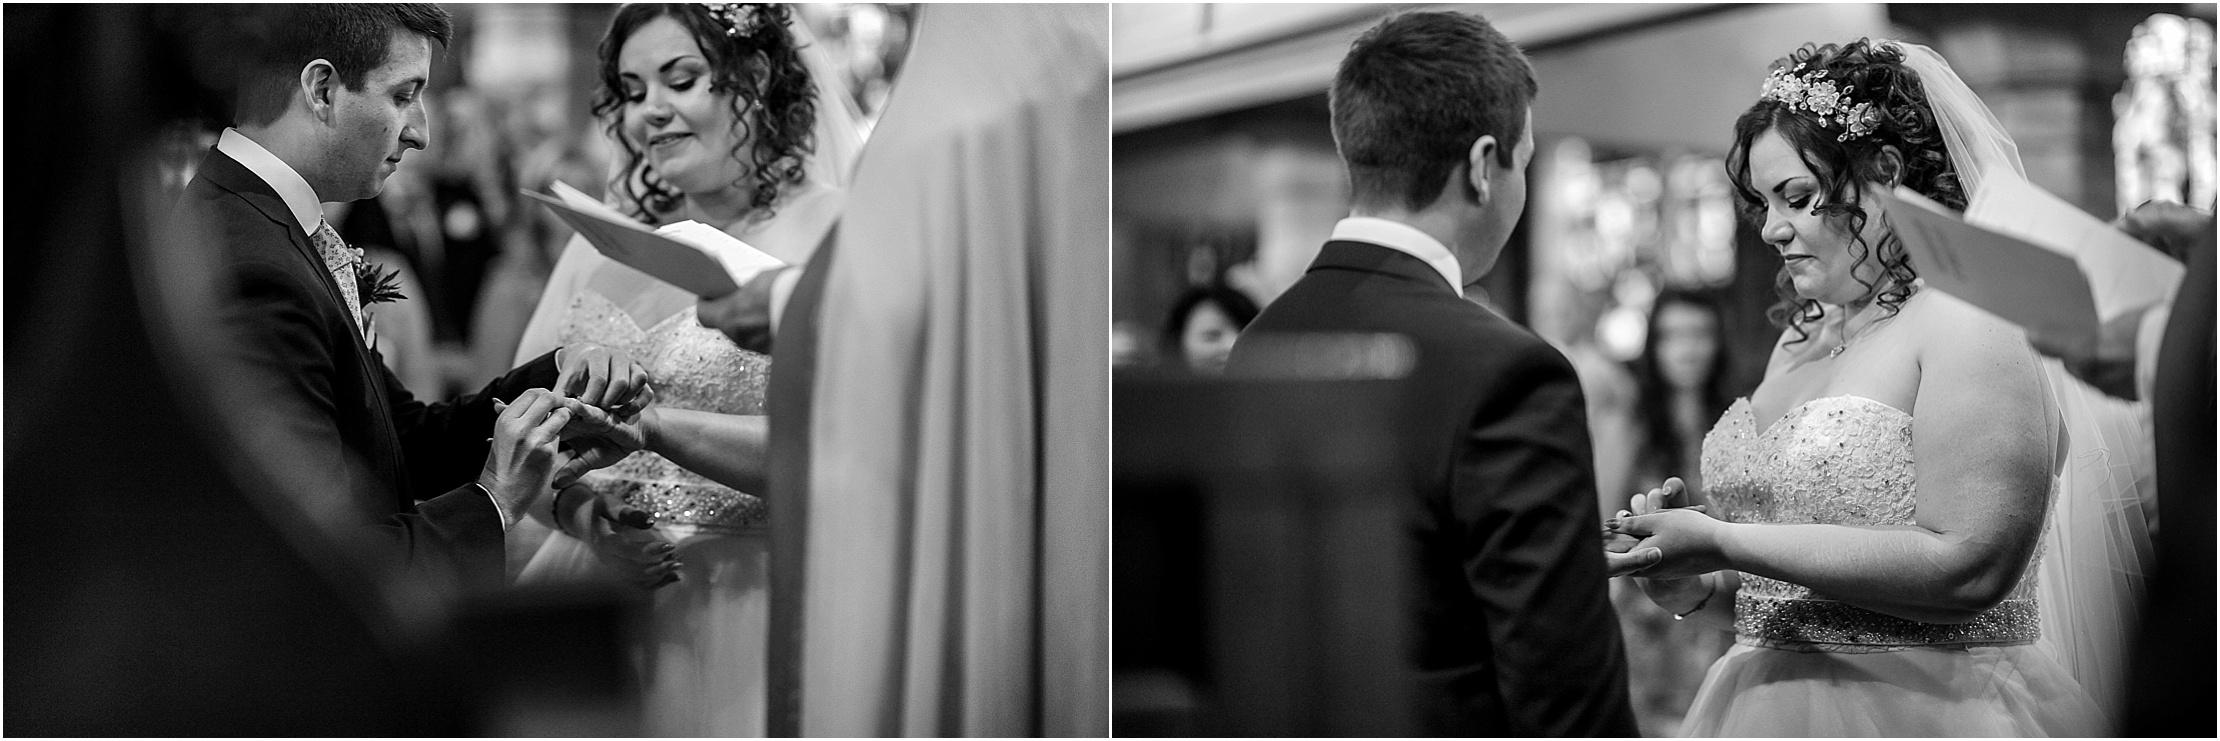 shireburn-arms-wedding- 057.jpg